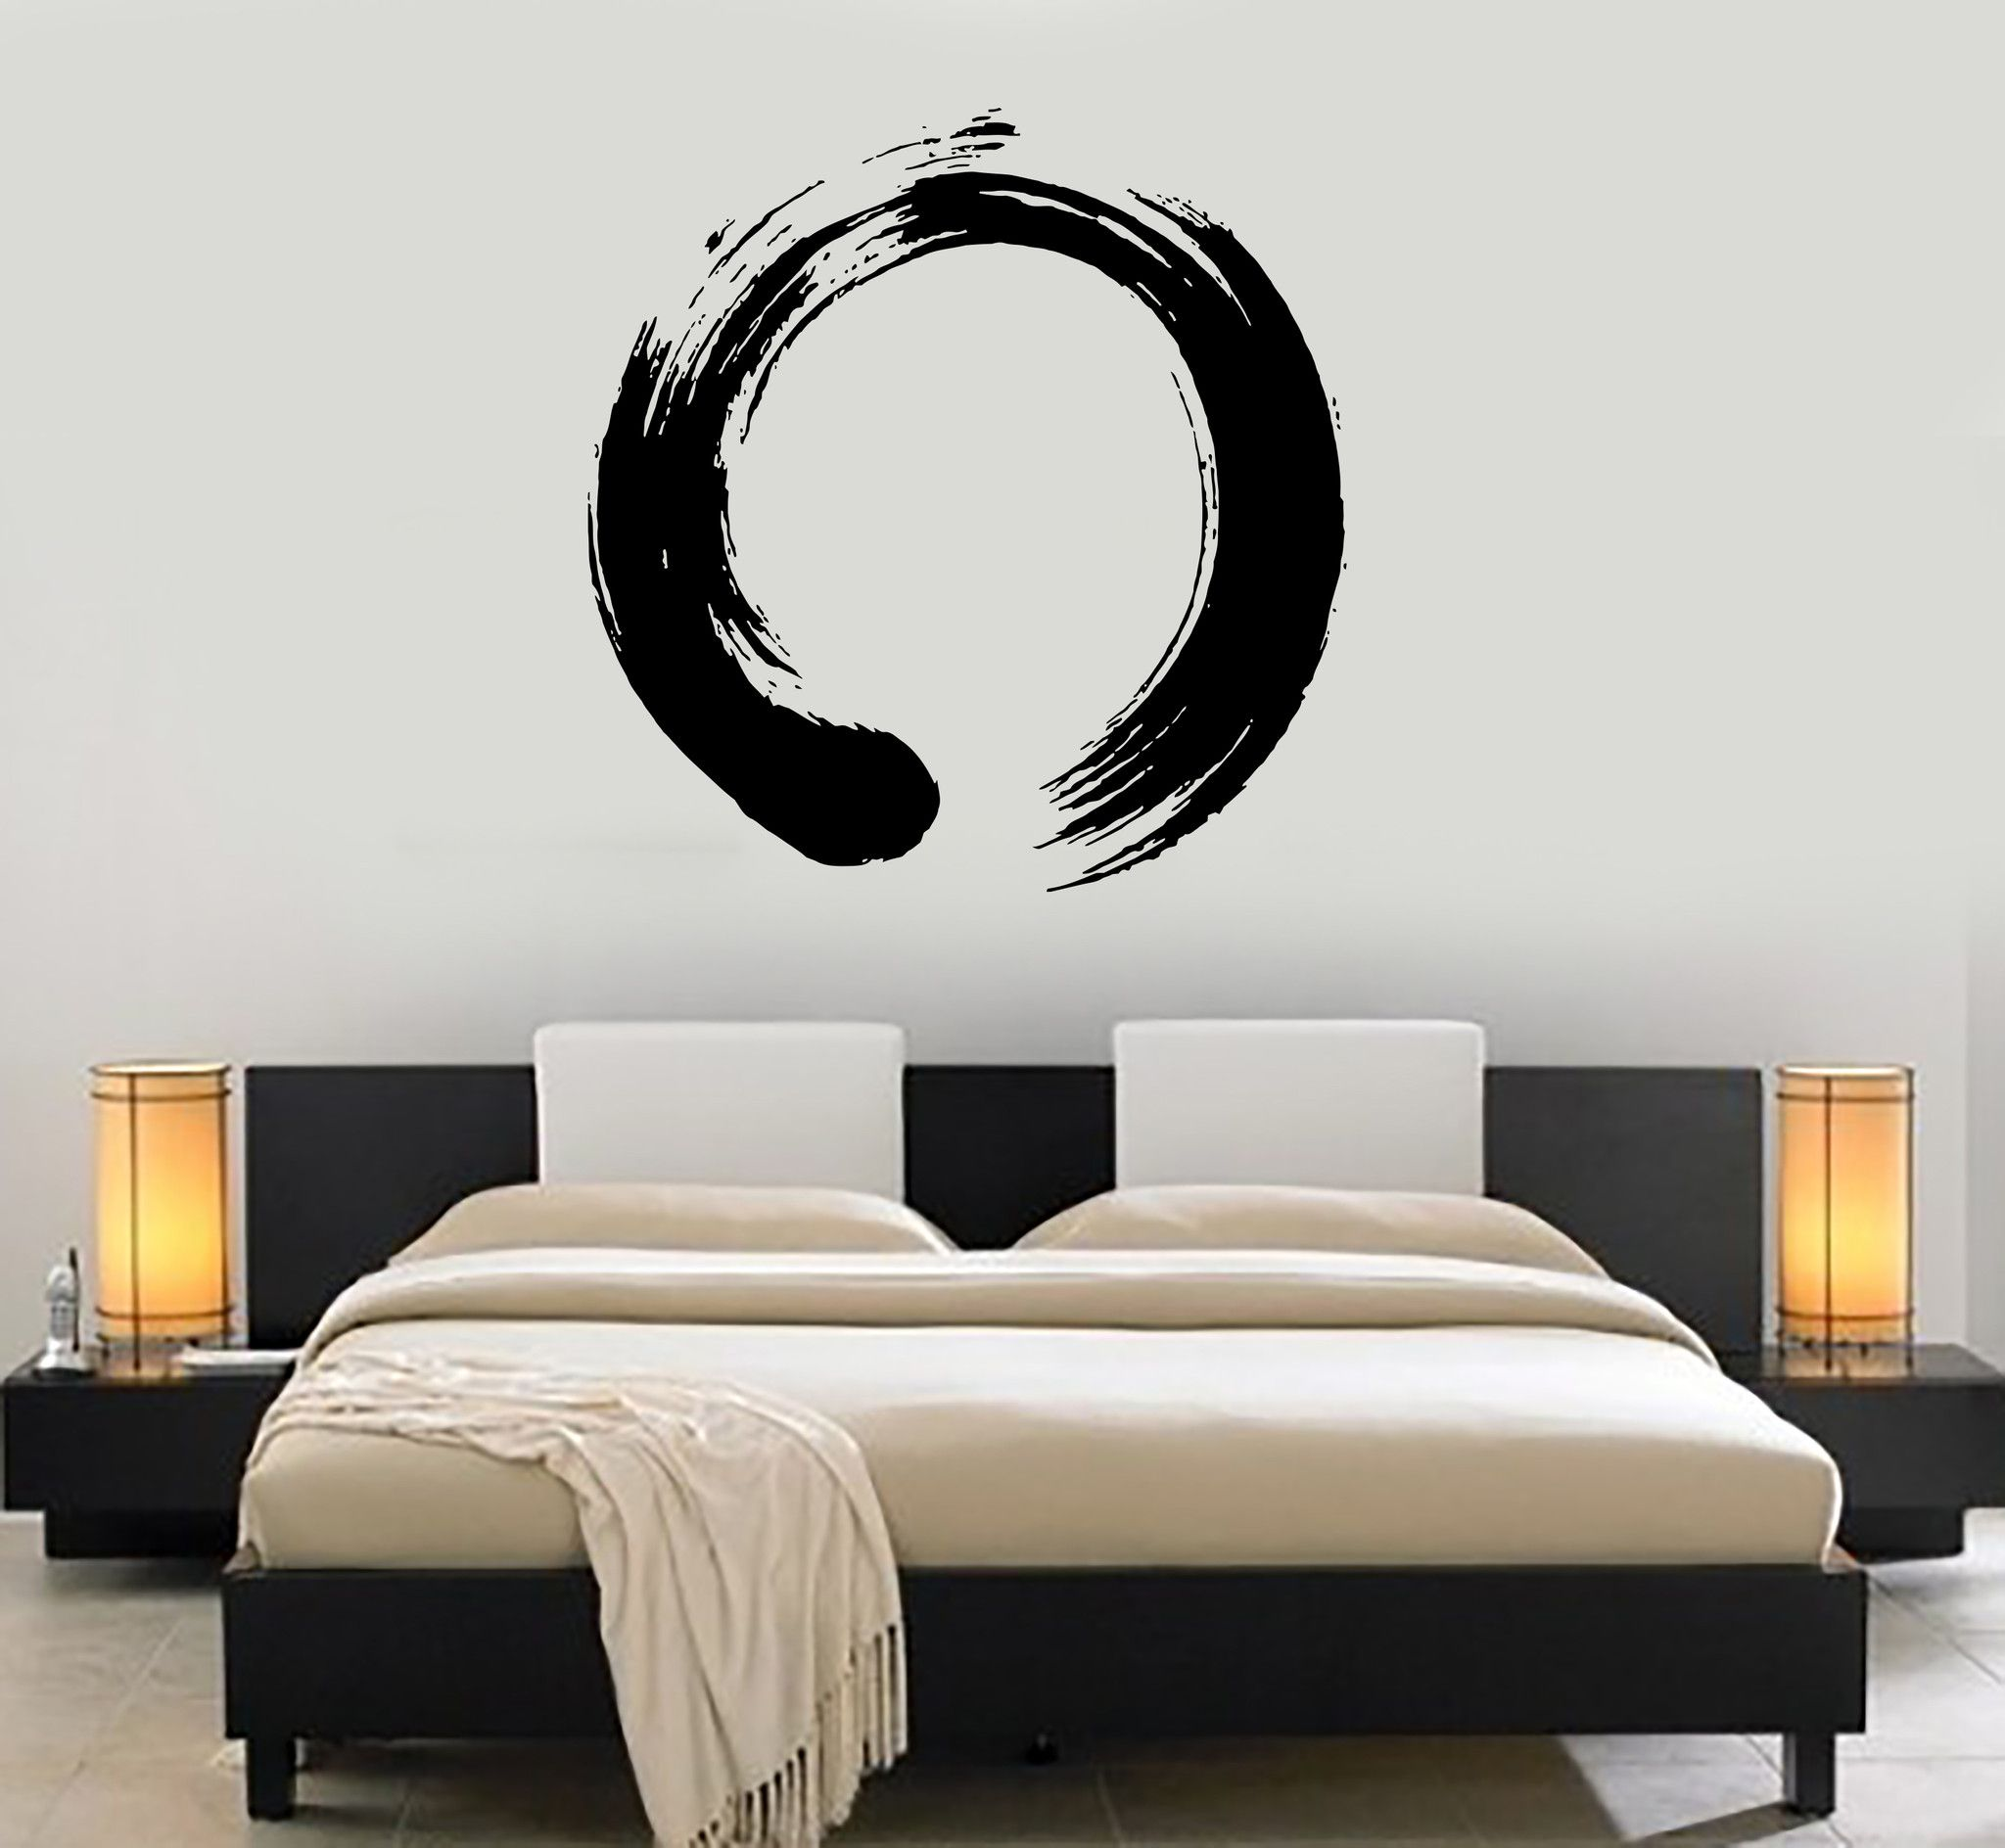 Decal Vinyl Wall Circle Enso Zen Calligraphy Japan Nirvana - Zen wall decalsvinyl wall decal yin yang yoga zen meditation bedroom decor